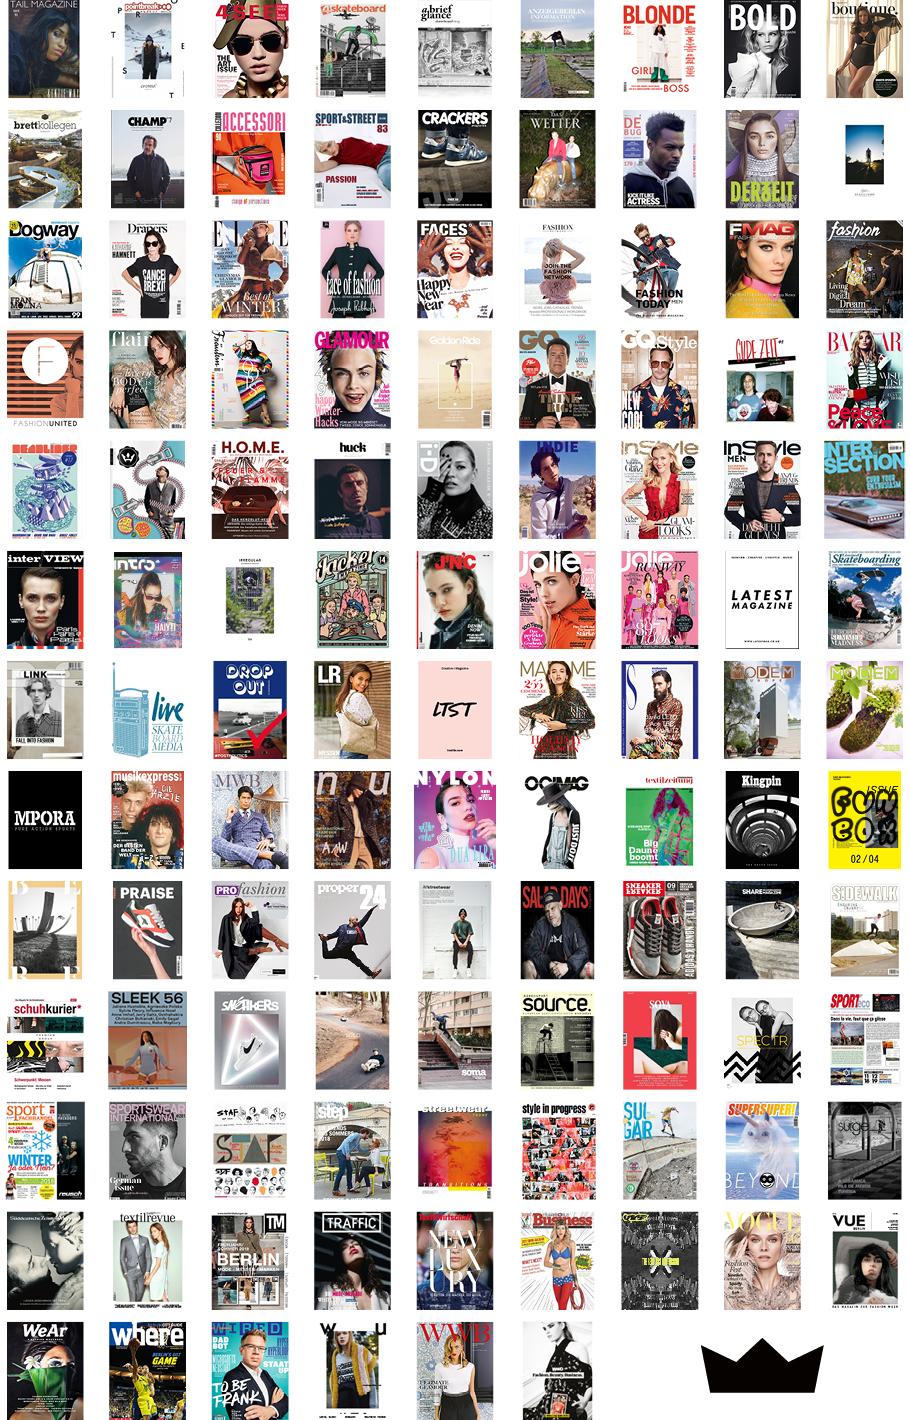 171206-Media Partners (1).jpg